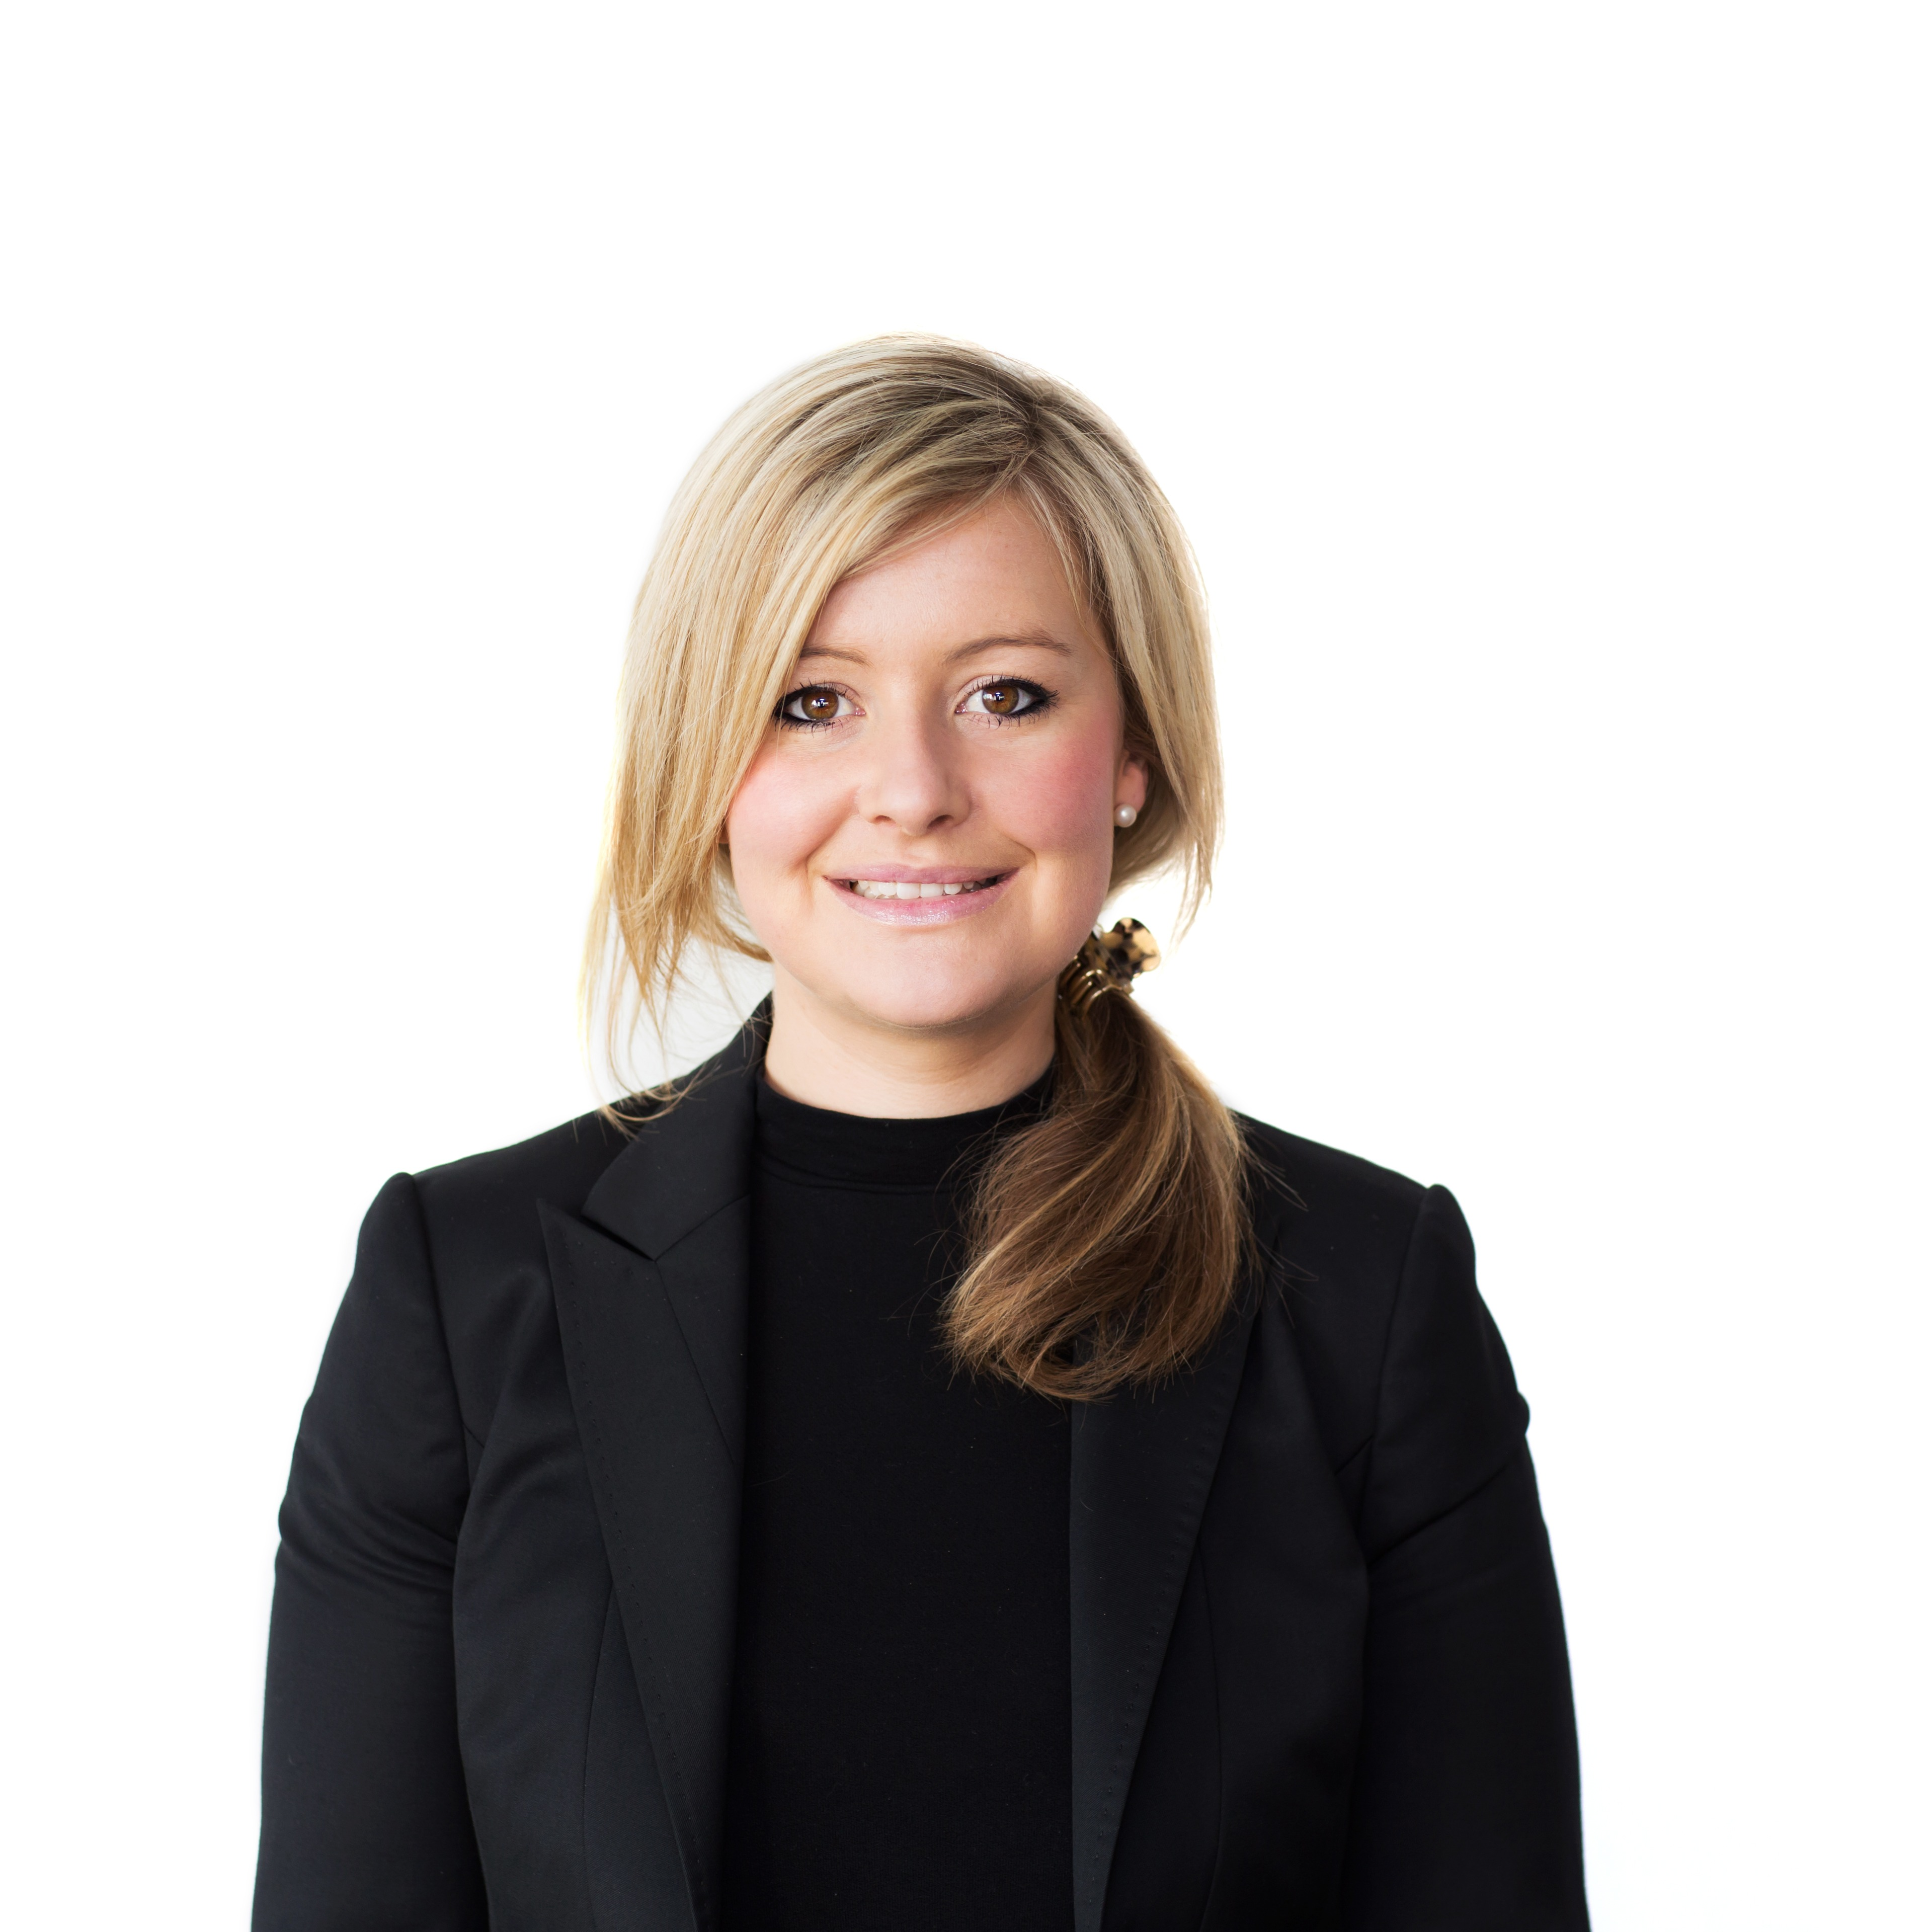 Karen Small